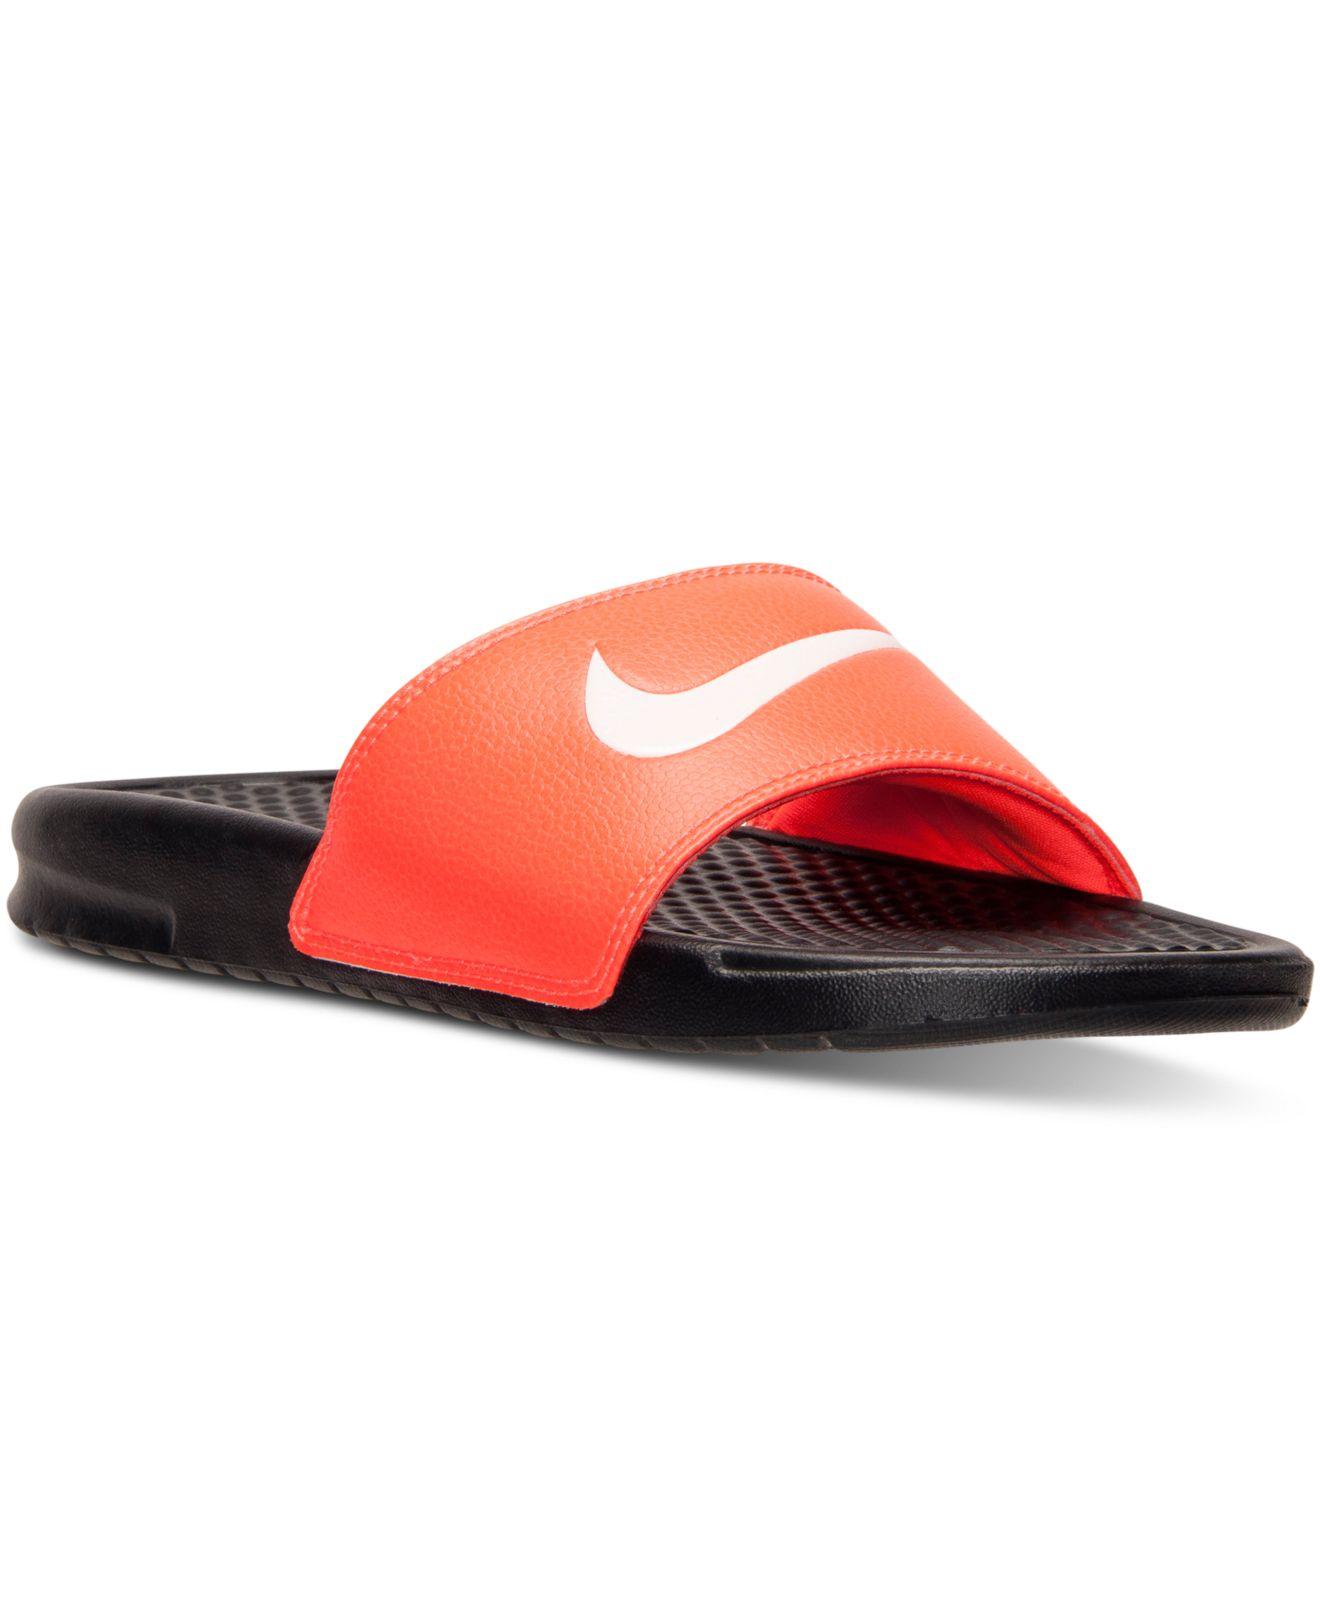 e728f5b00162 ... sale lyst nike mens benassi swoosh slide sandals from finish line in  ac3ab 38bbb